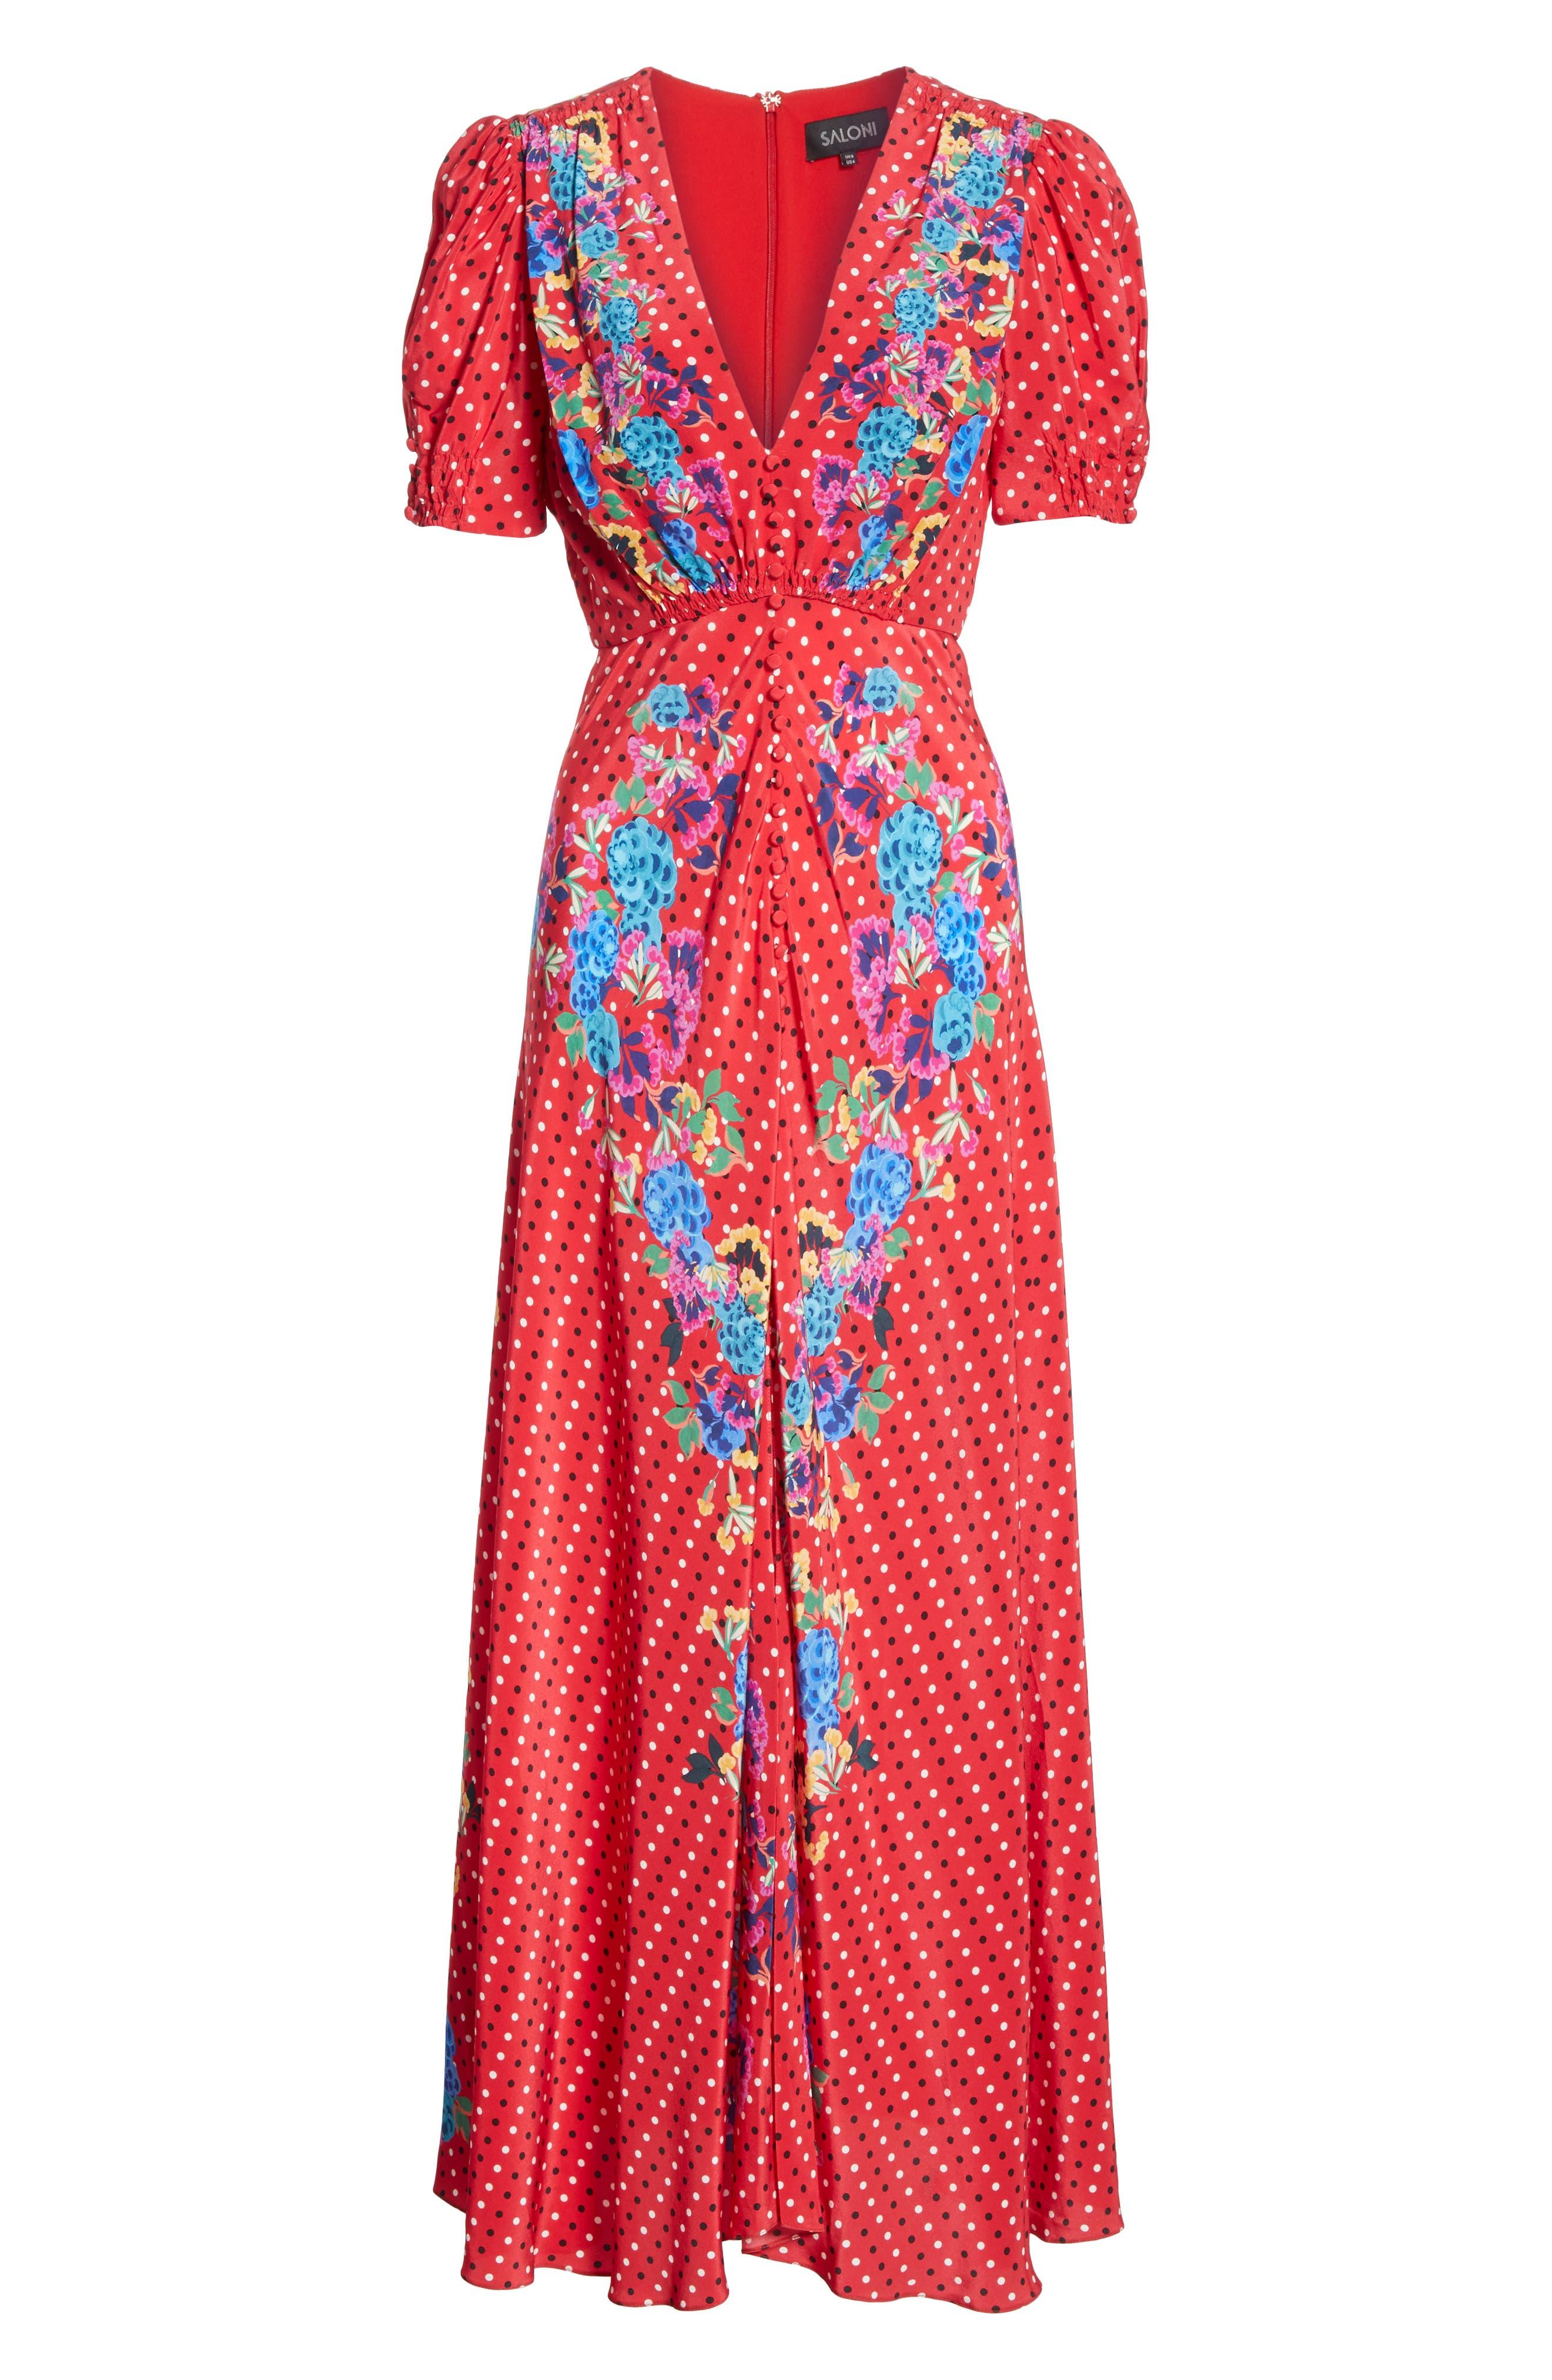 SALONI, Lea Print Silk Maxi Dress, Alternate thumbnail 6, color, SCARLET POLKA DOT